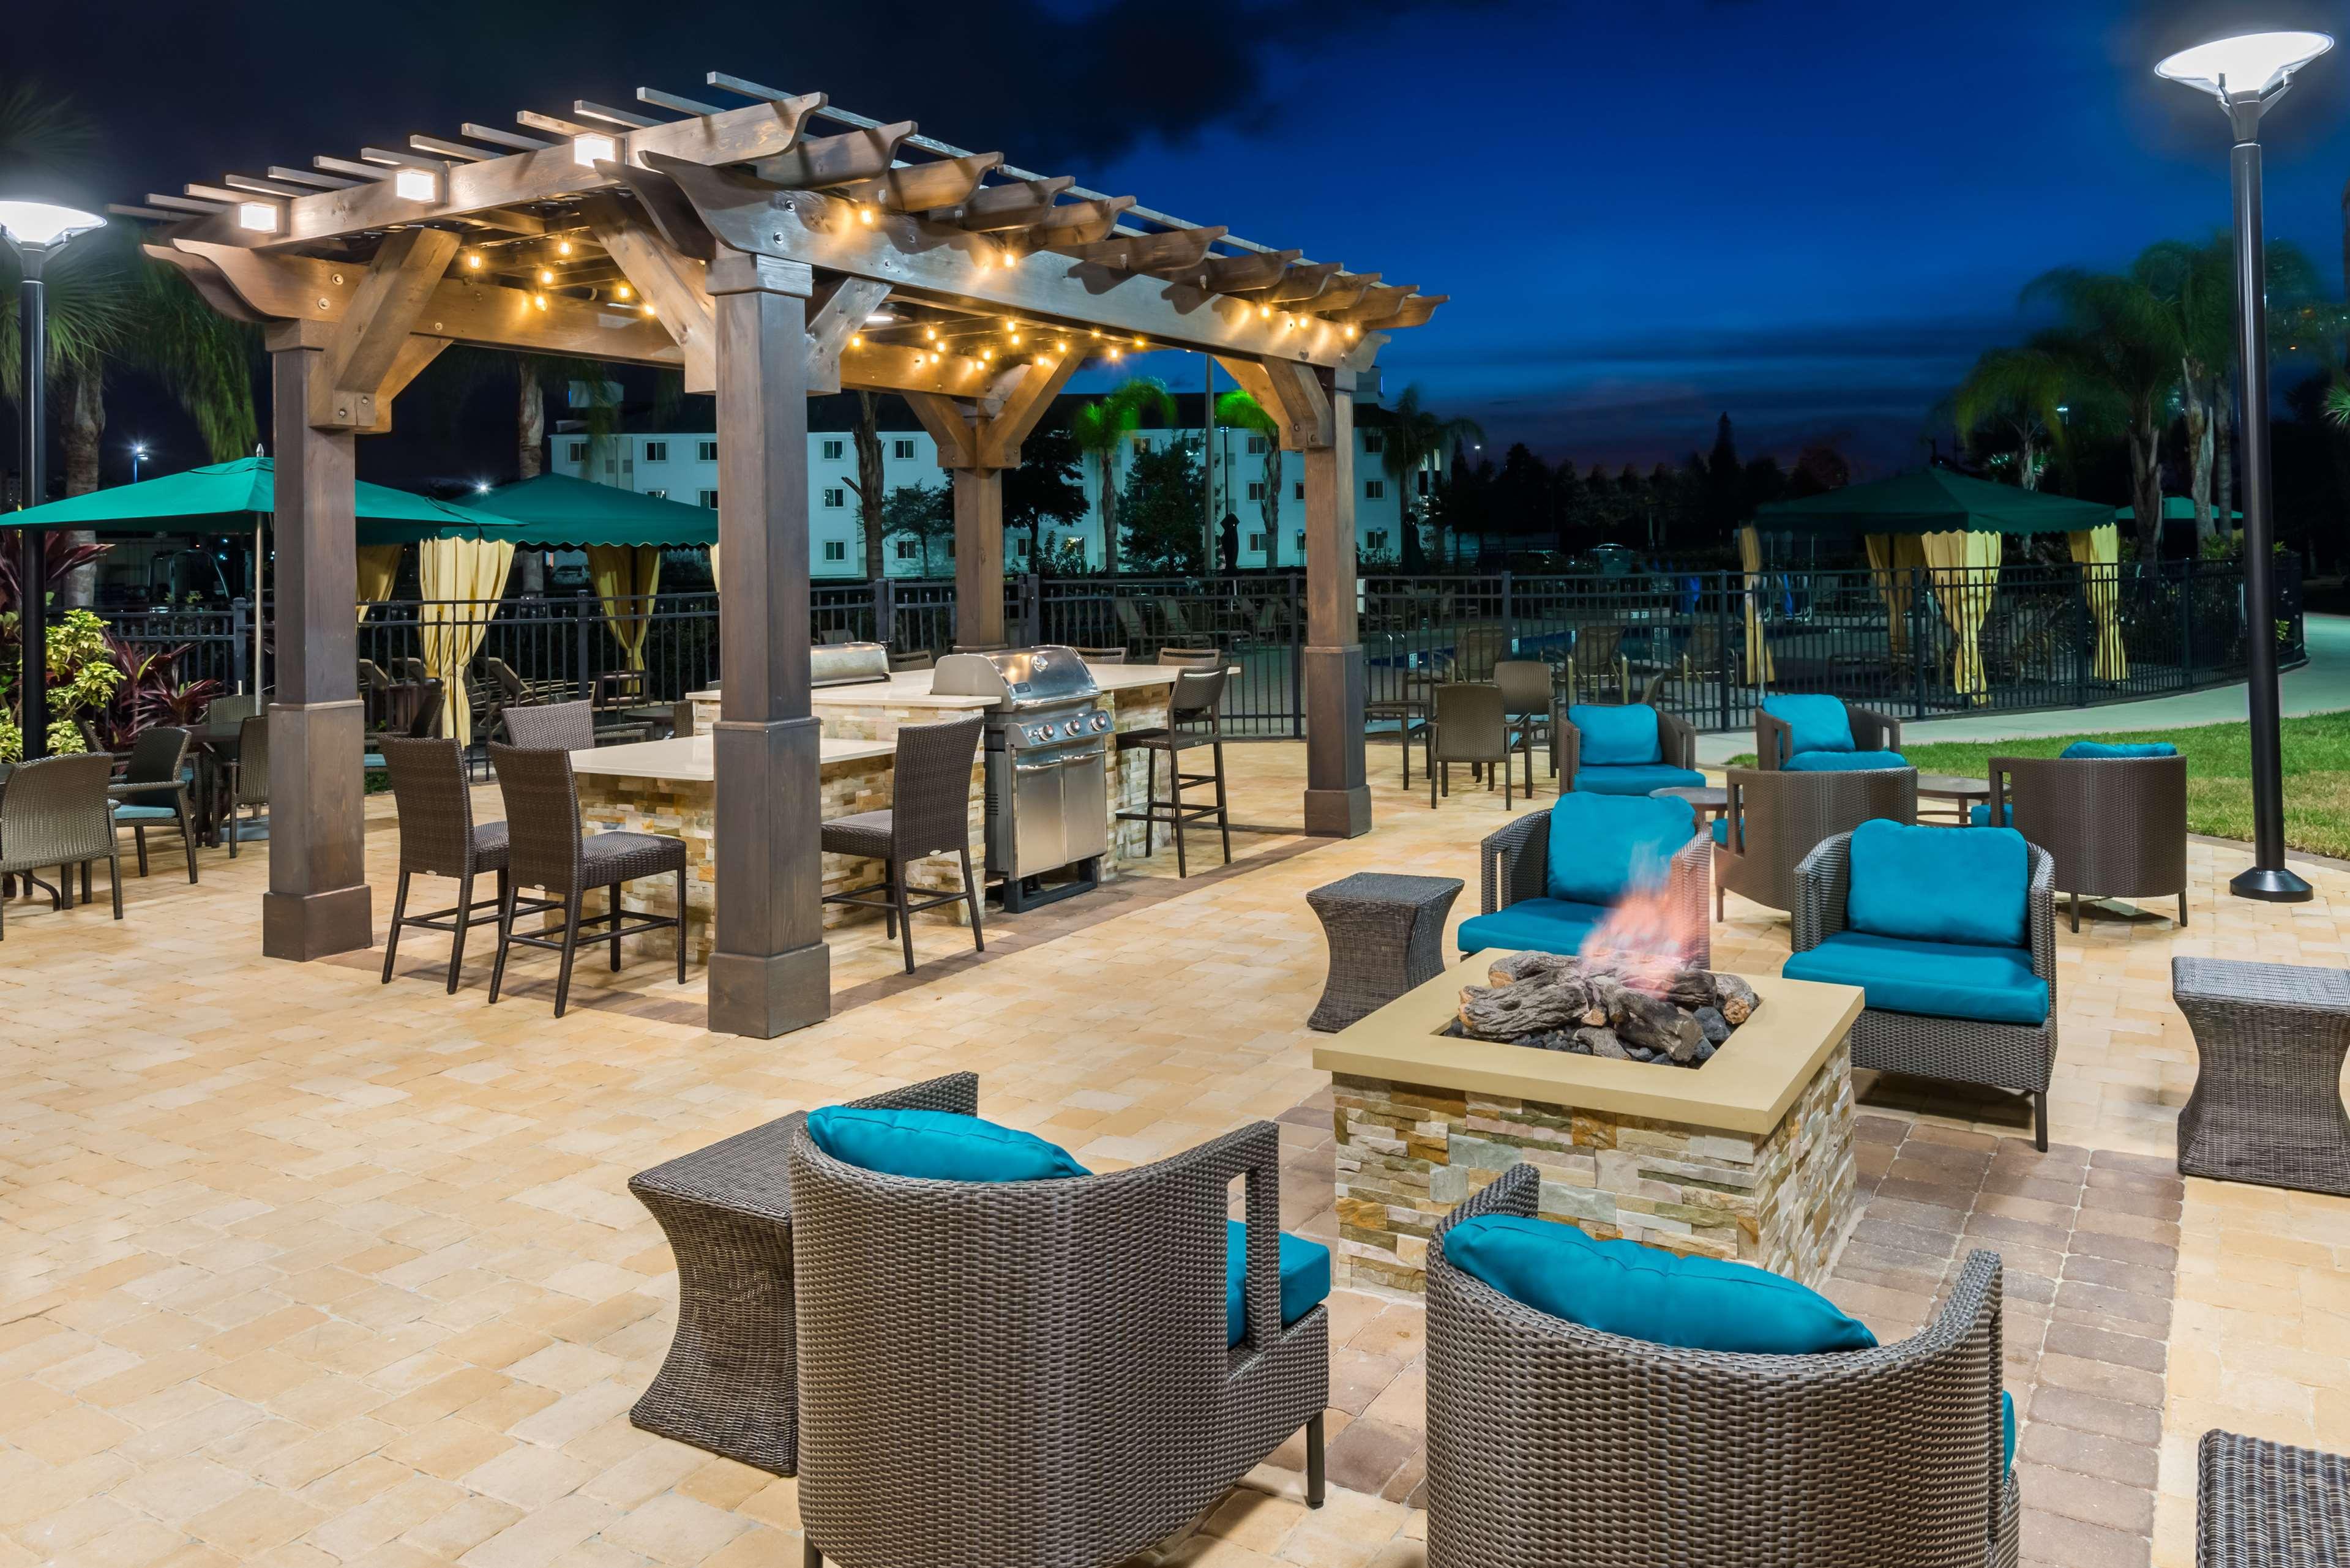 Homewood Suites by Hilton Orlando-Nearest to Univ Studios